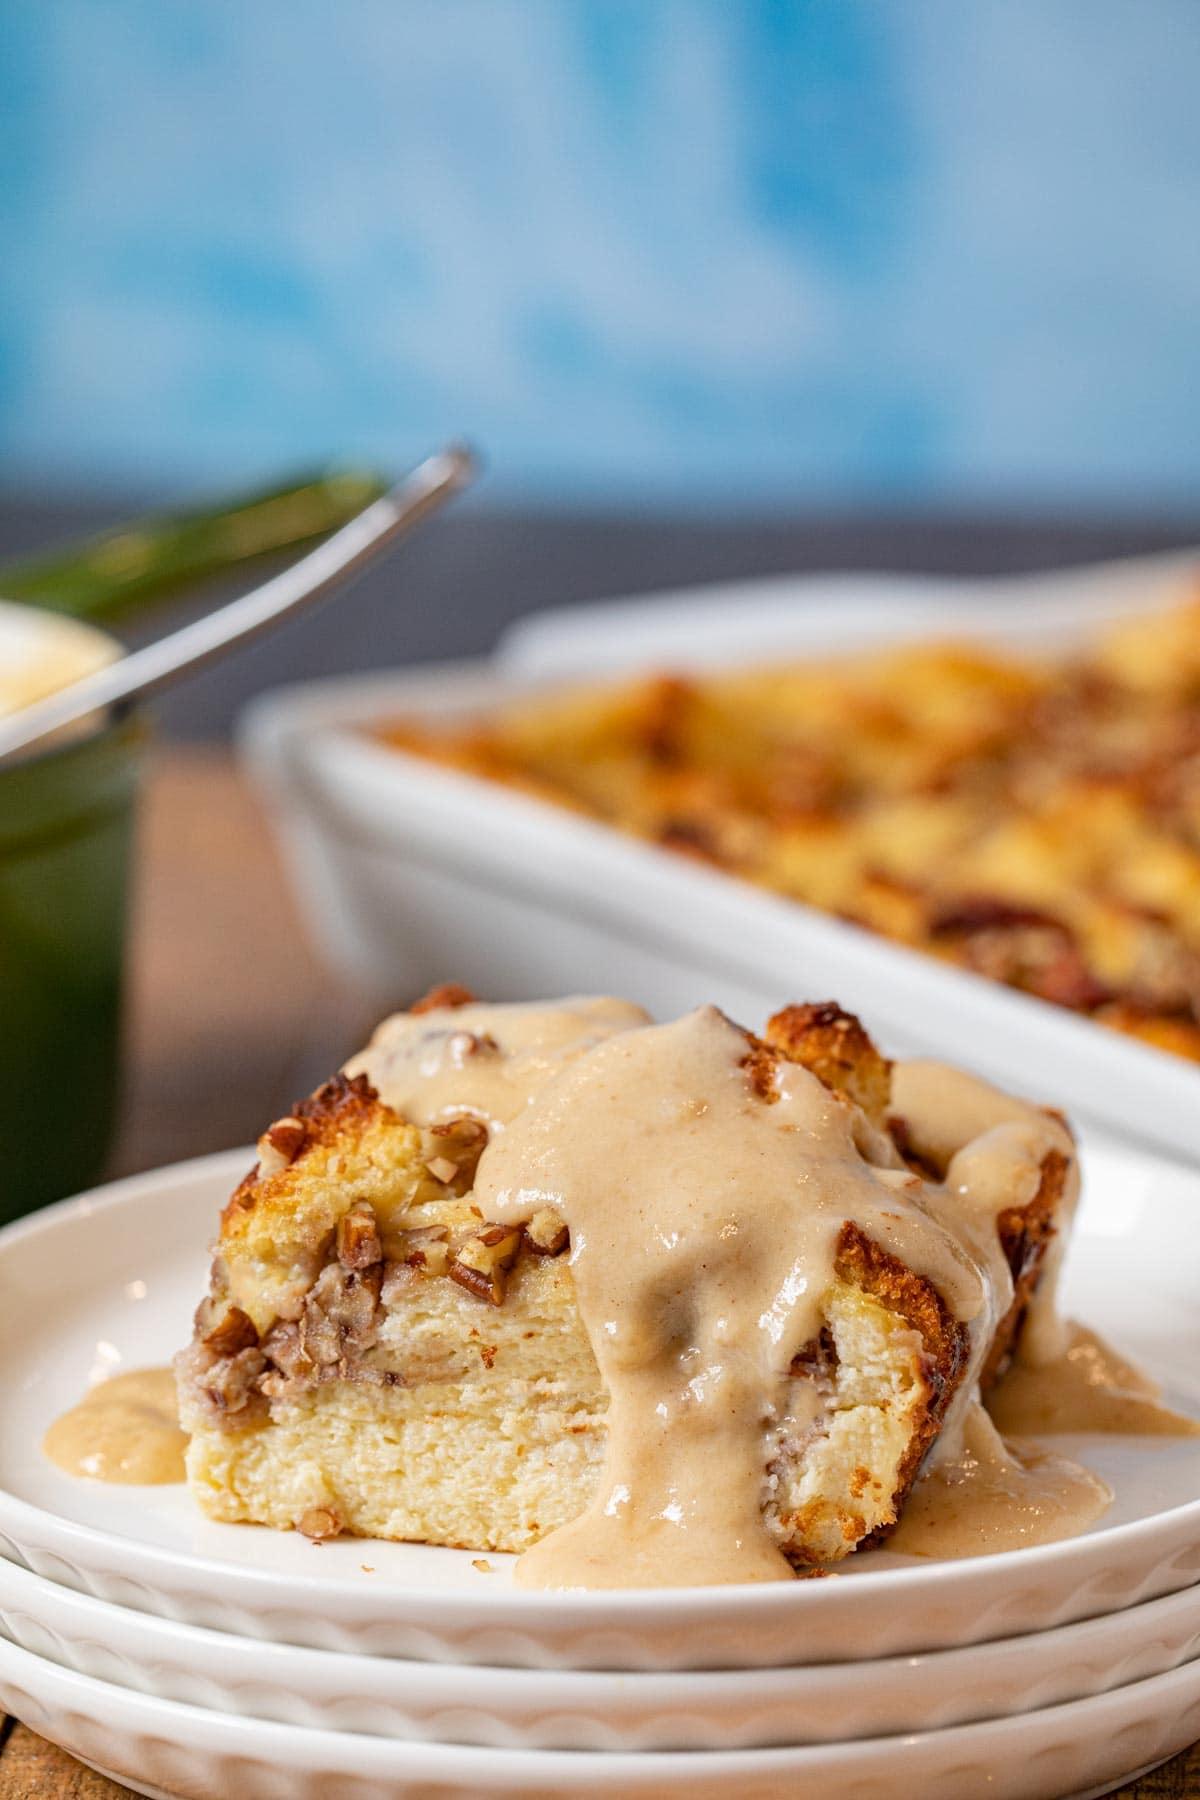 Bourbon Pecan Bread Pudding serving on plate with bourbon vanilla sauce